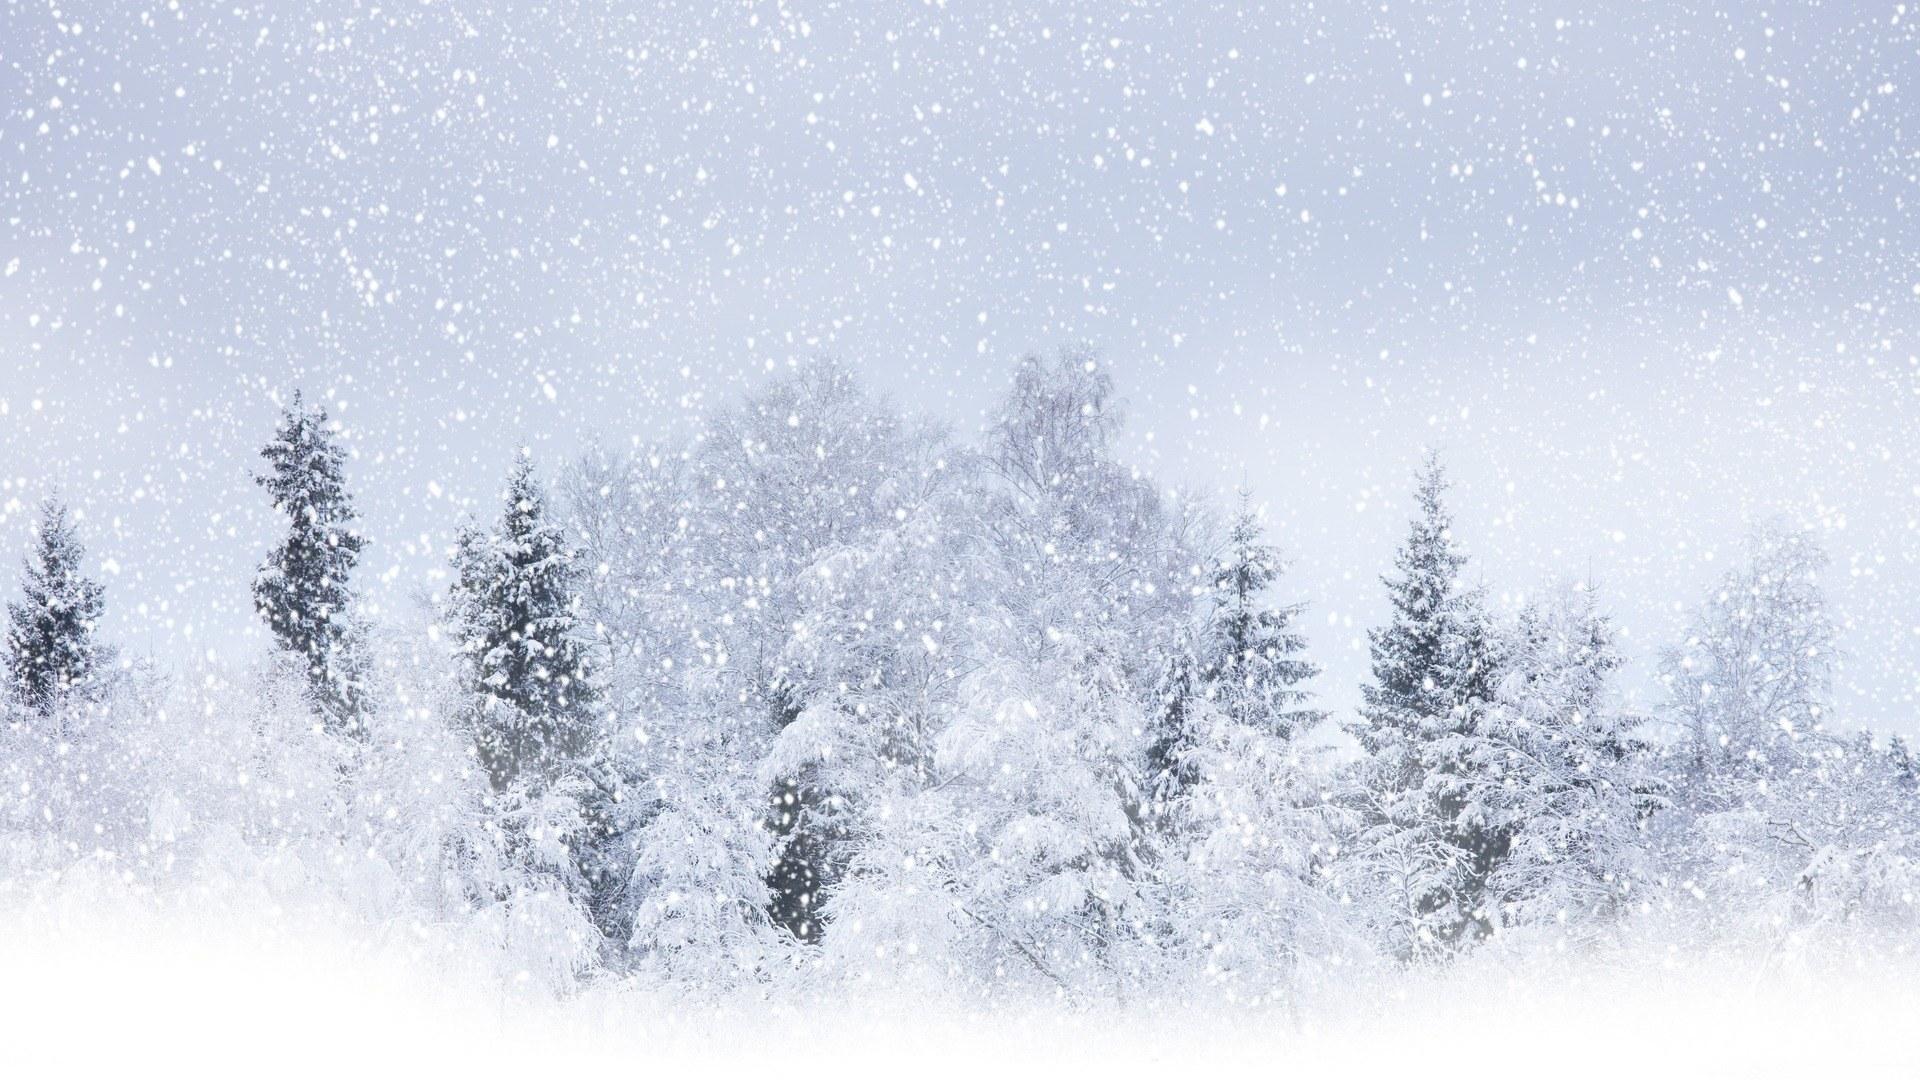 Winter Wonderland Background 44 Images